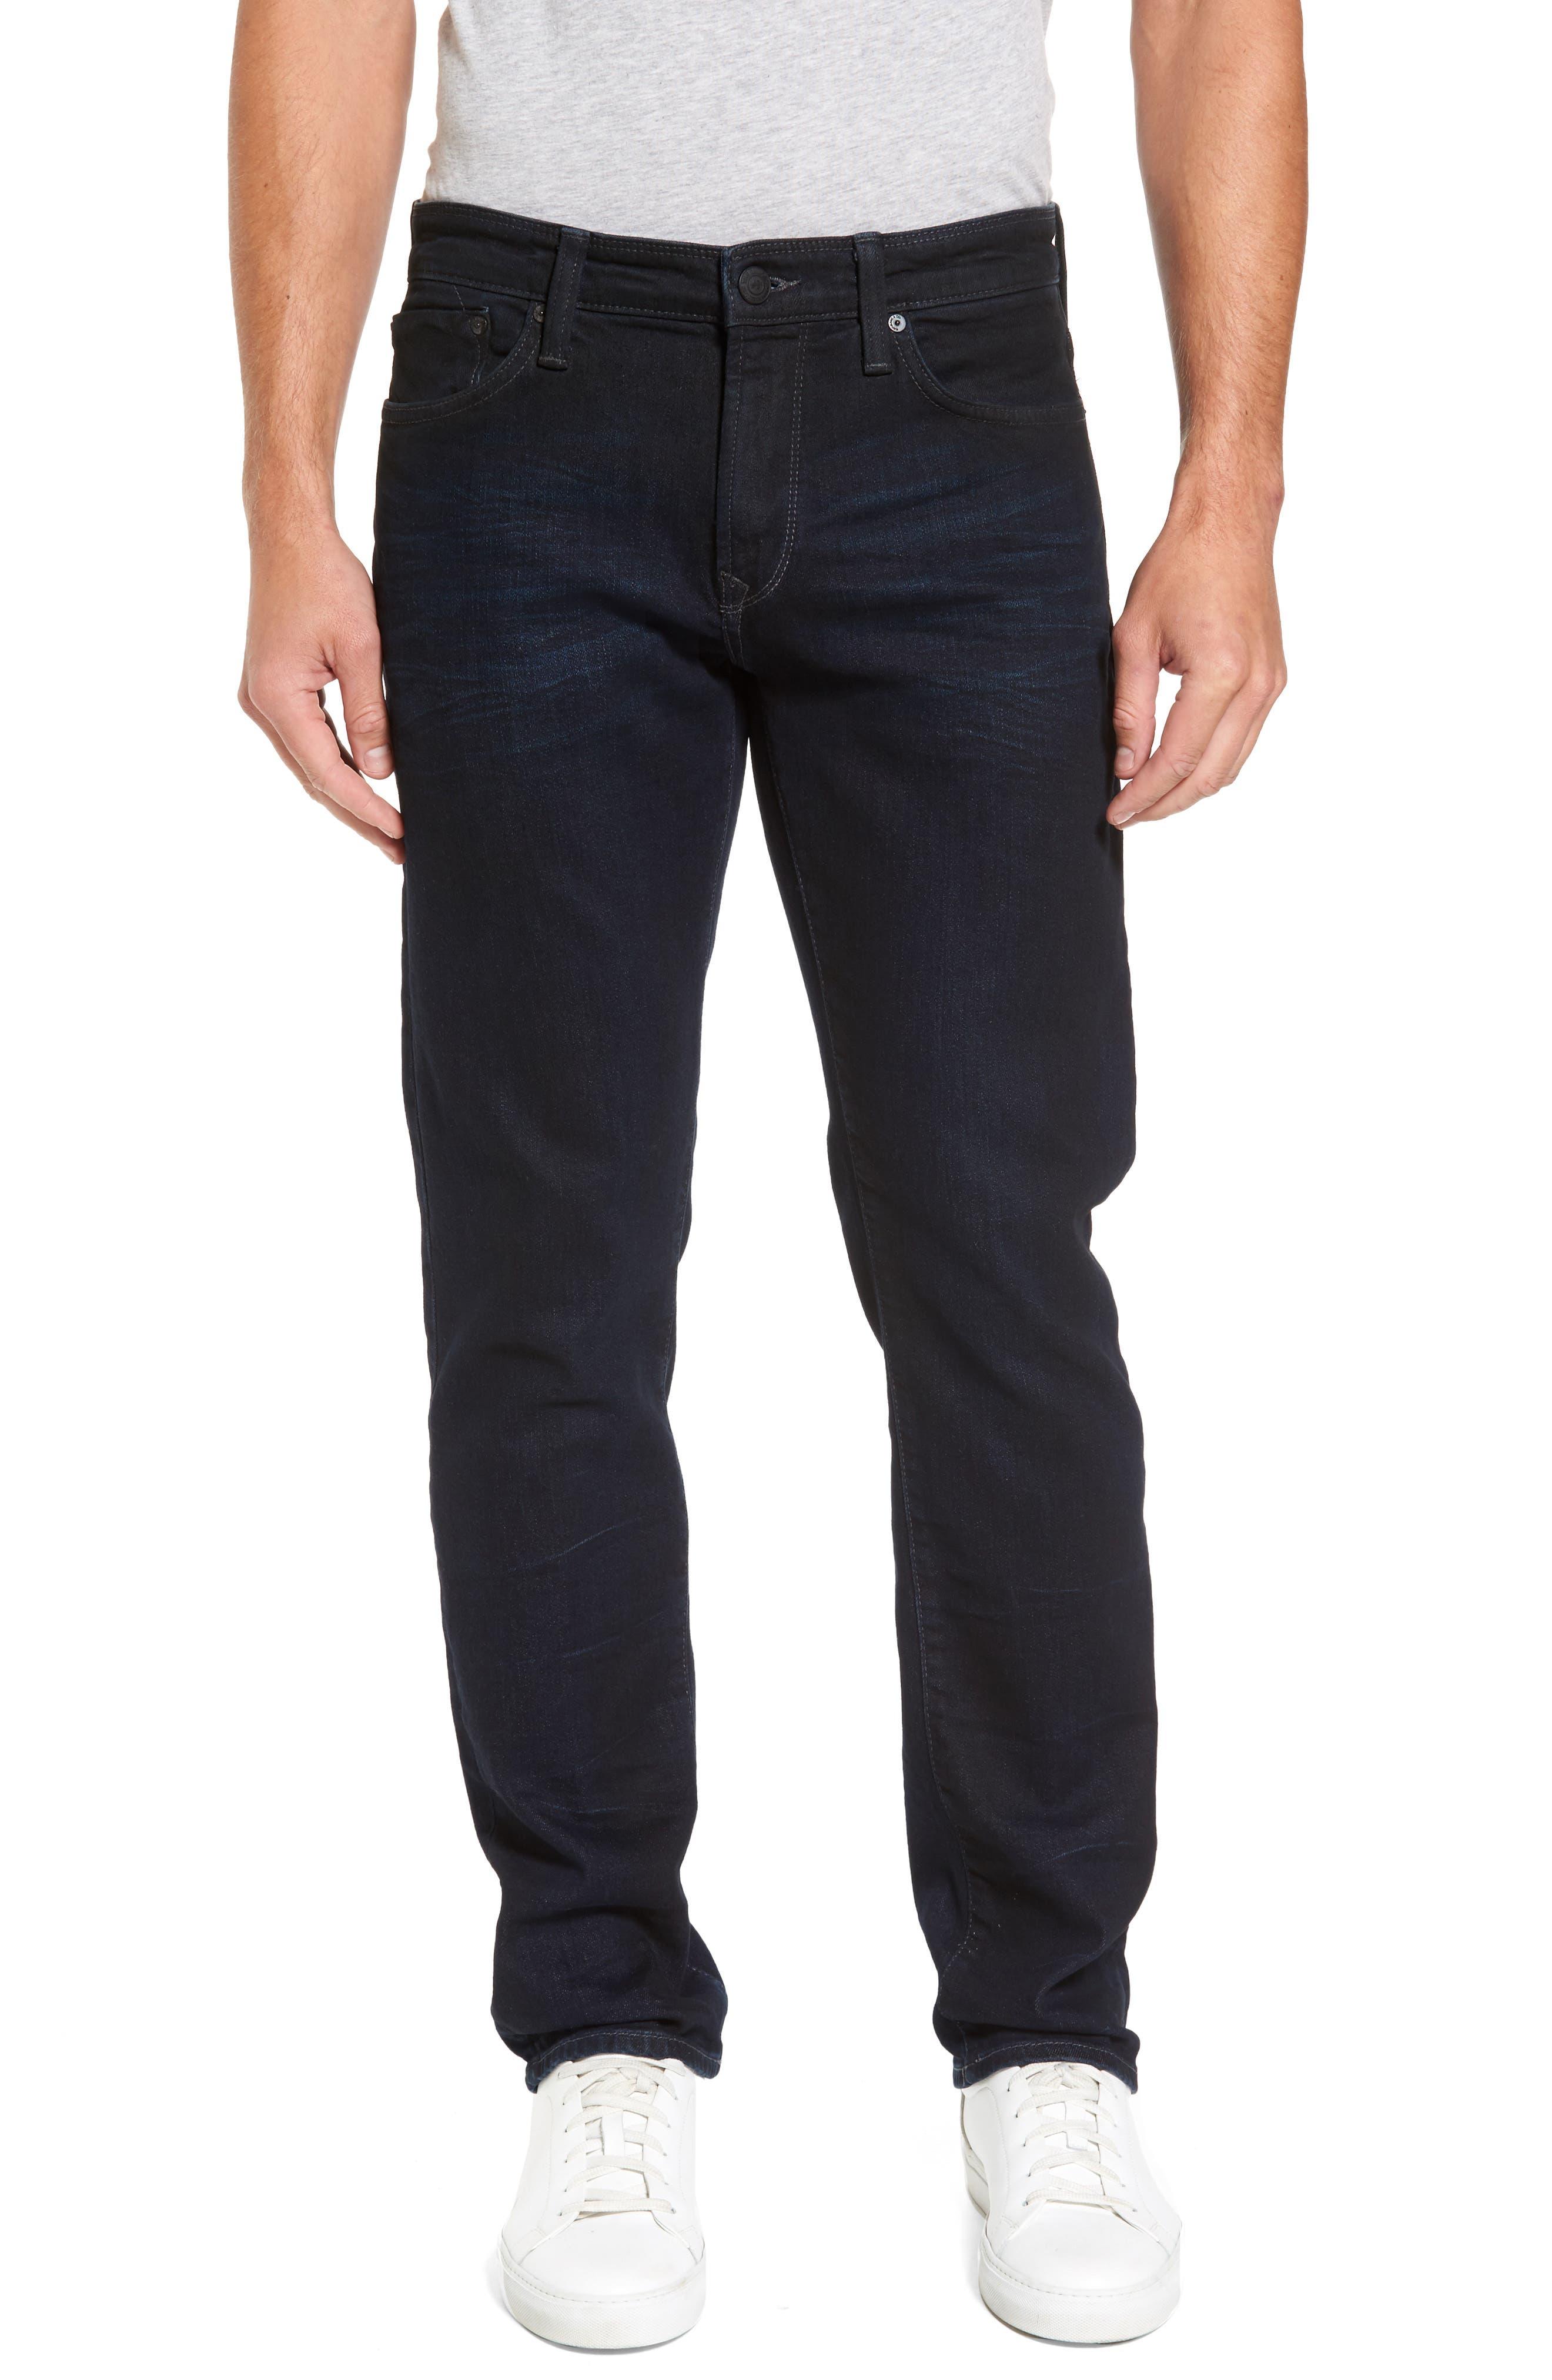 Main Image - Mavi Jeans Zach Straight Leg Jeans (Coated Authentic Vintage)